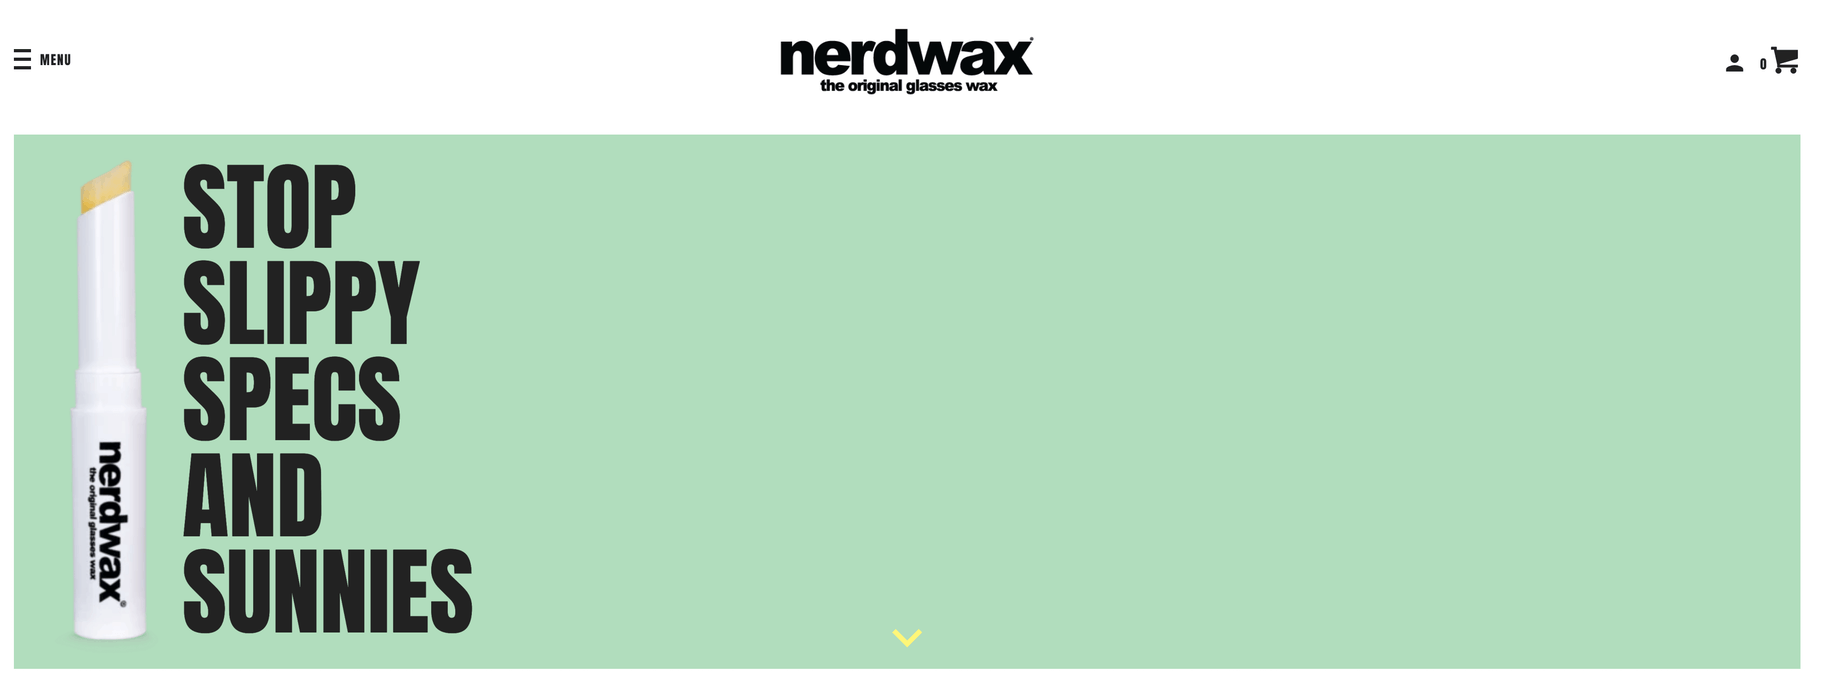 nerdwax shopify commerce